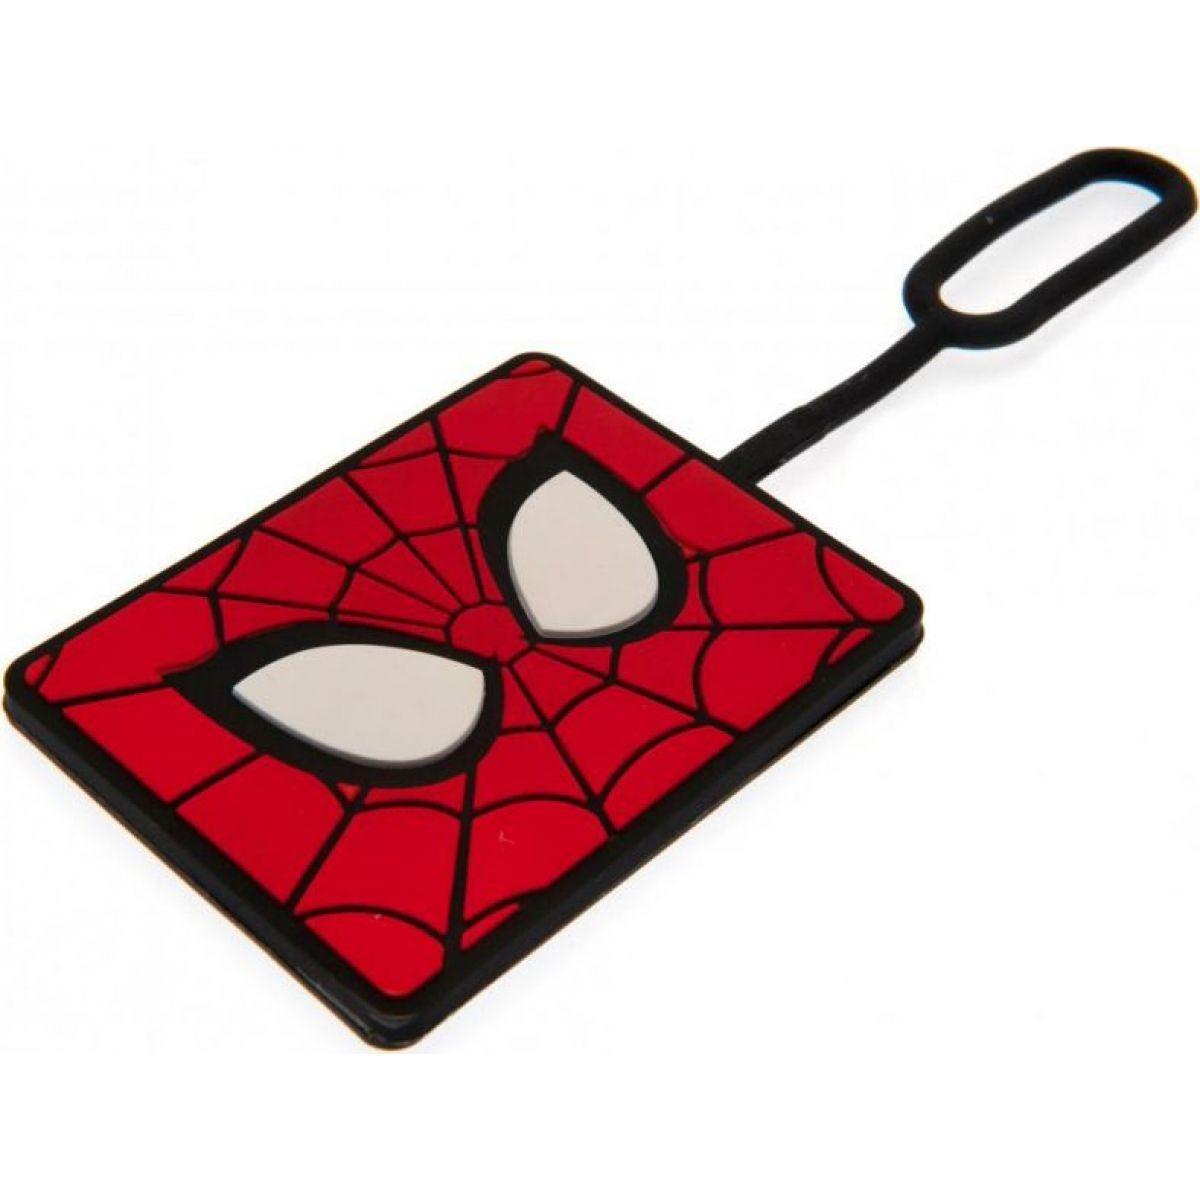 Epee Merch Visačka na kufr Spiderman